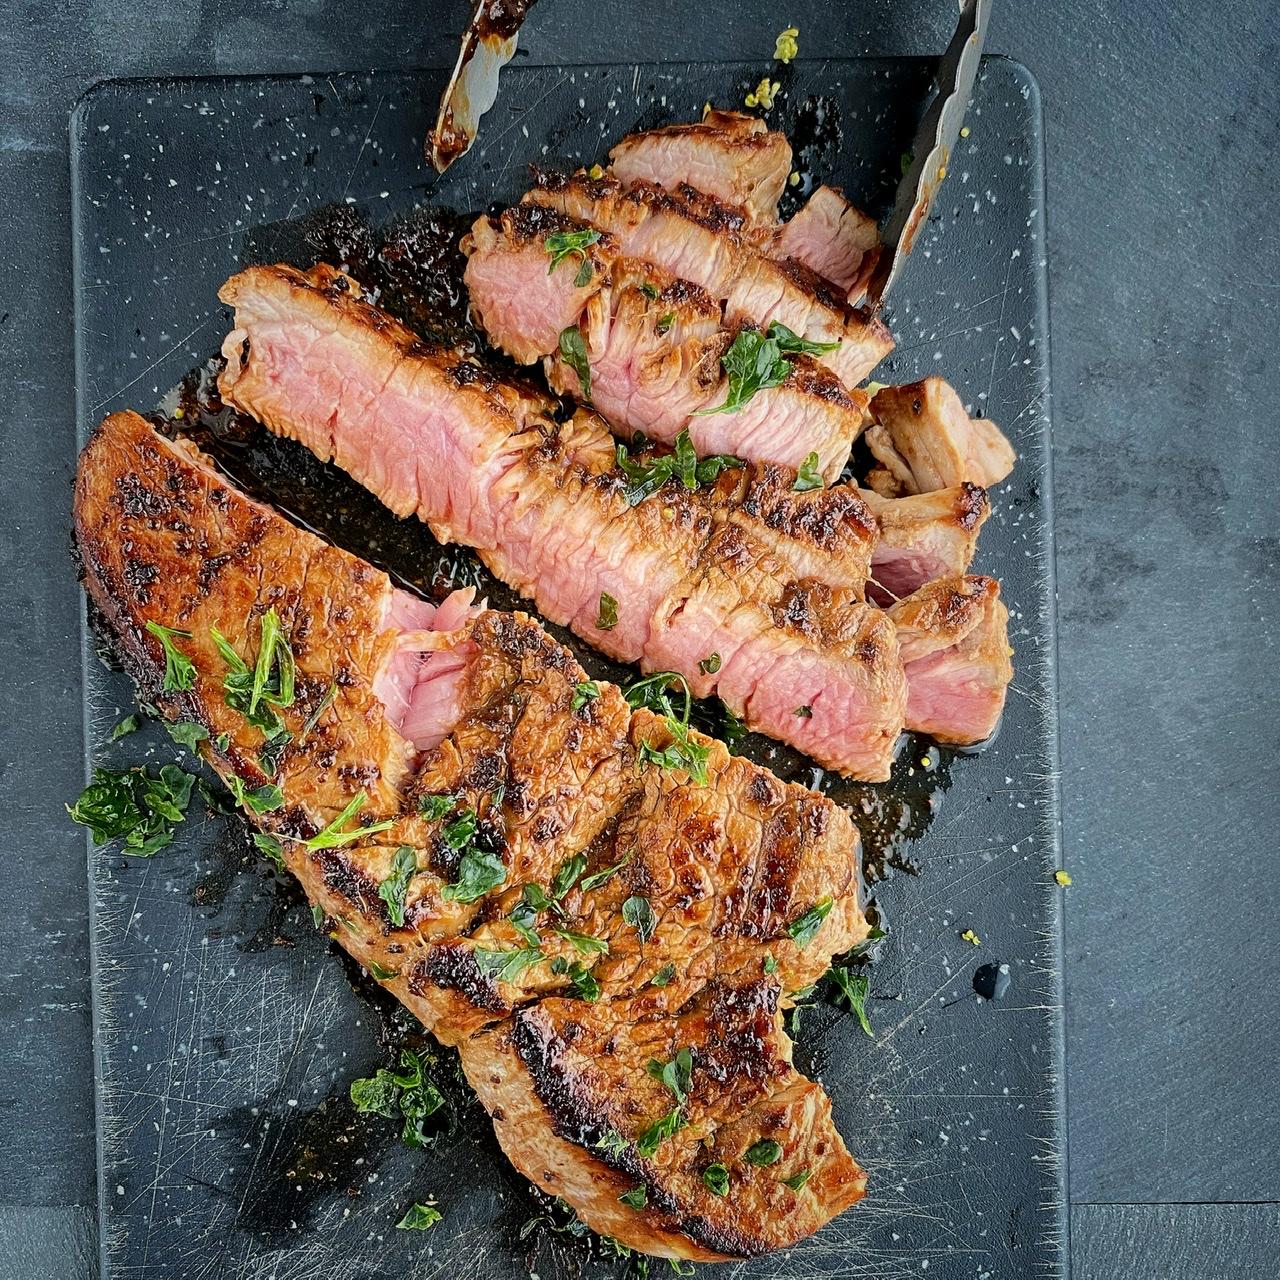 Miso-Glazed Skirt Steak Buckwheat Queen